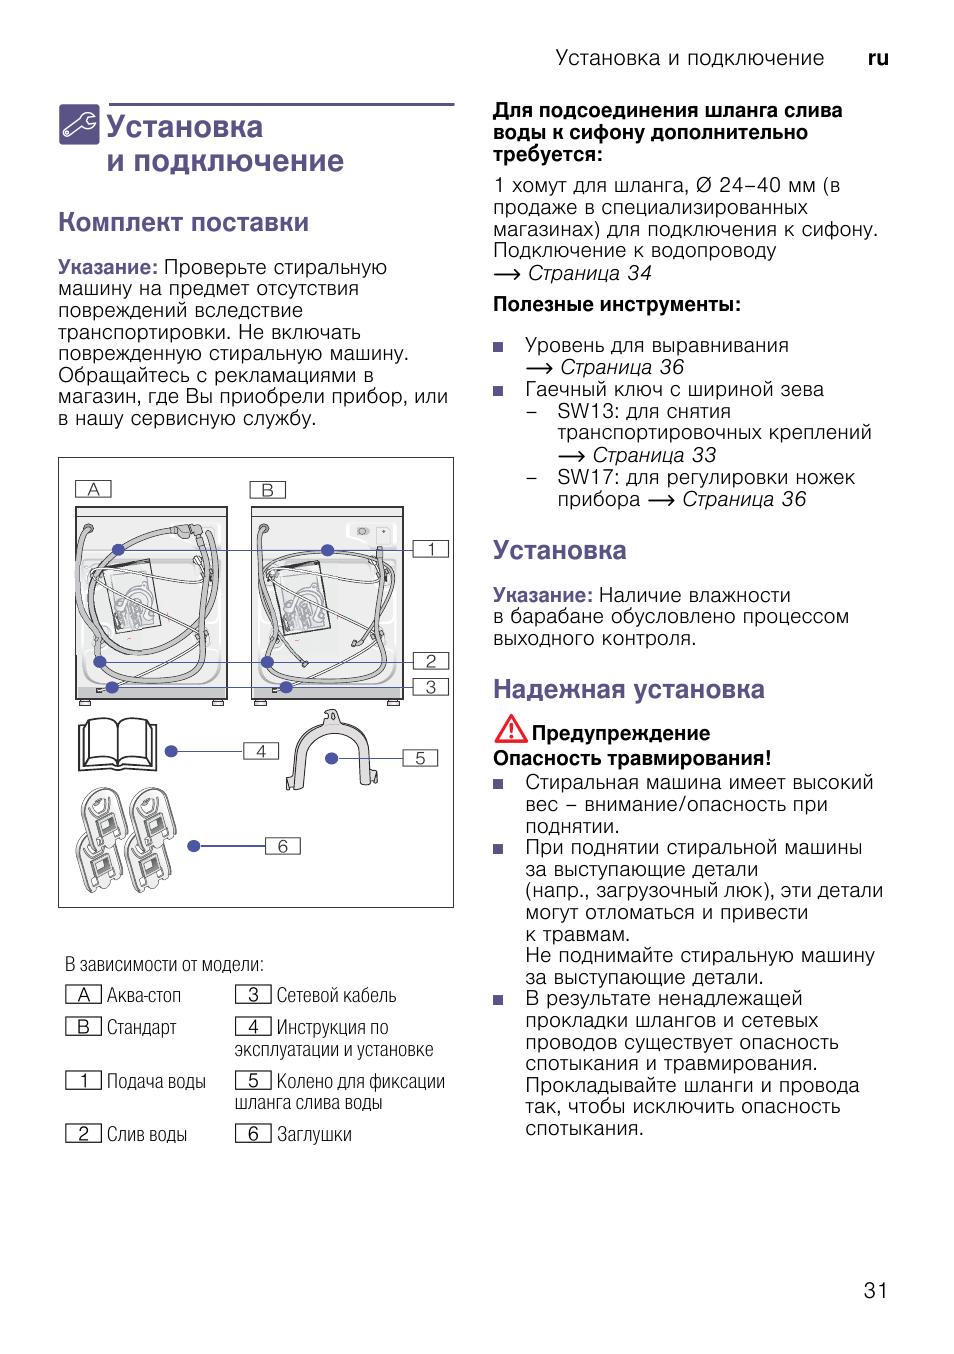 5 установка и подключение, Установка и подключение, Комплект поставки Инструкция по эксплуатации Siemens WS12K26SOE Страница 31